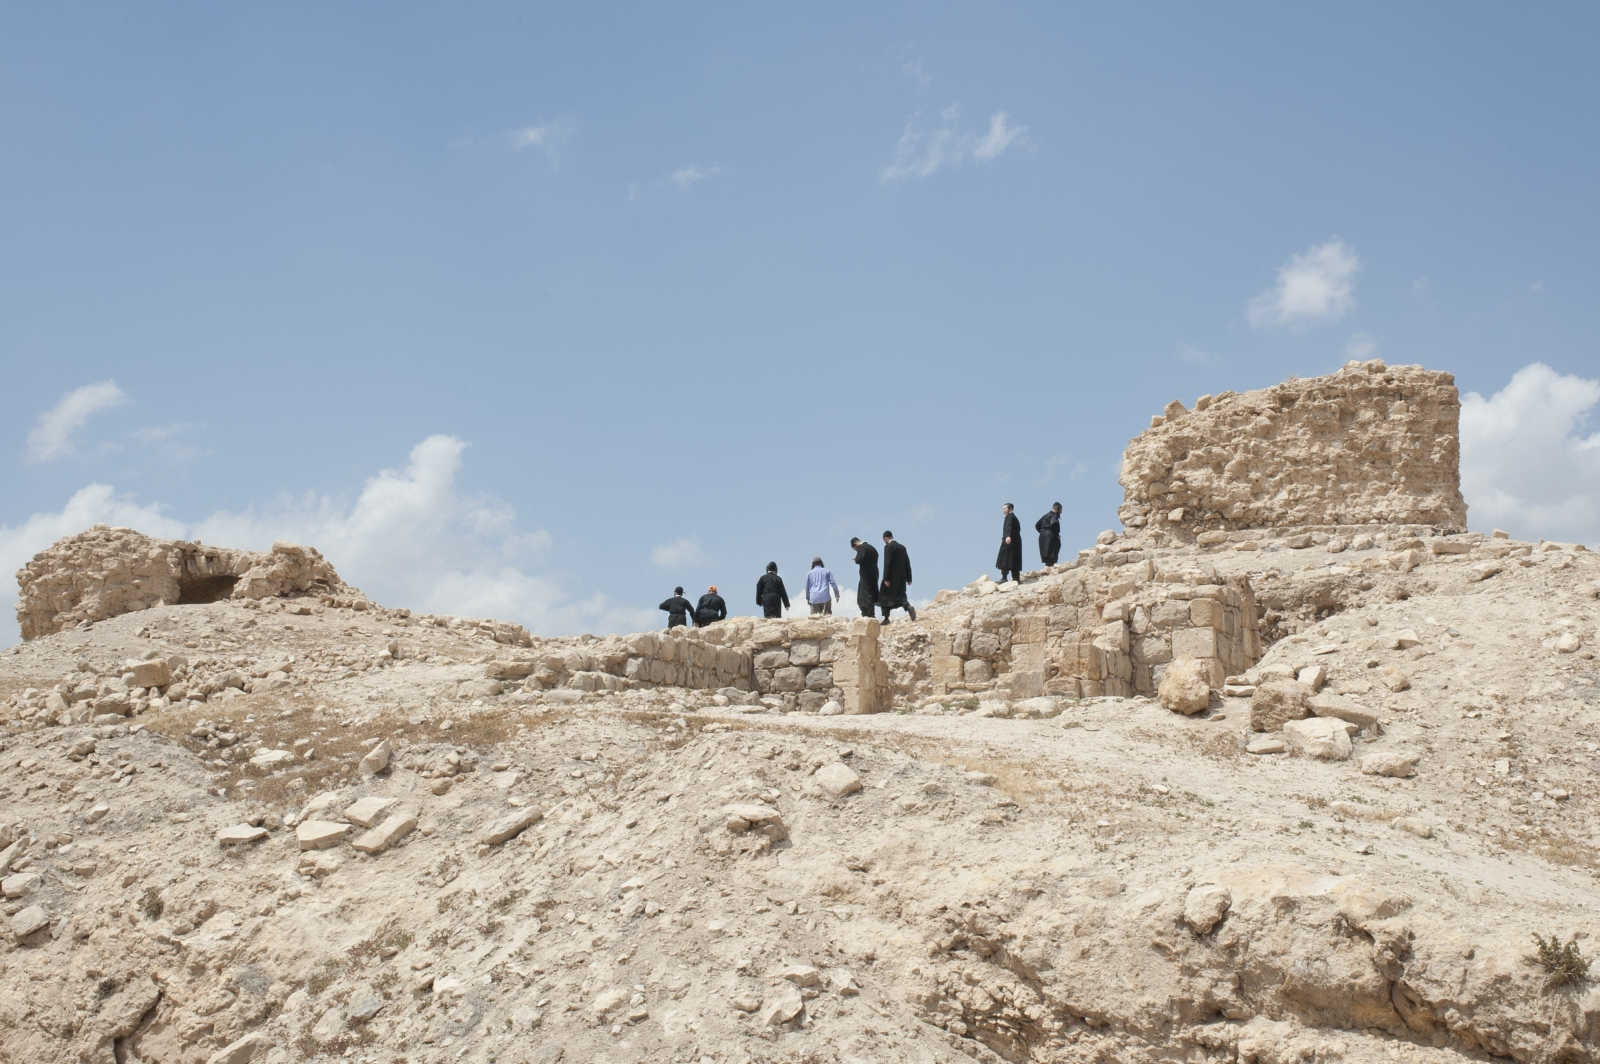 The Good Samaritan, West Bank